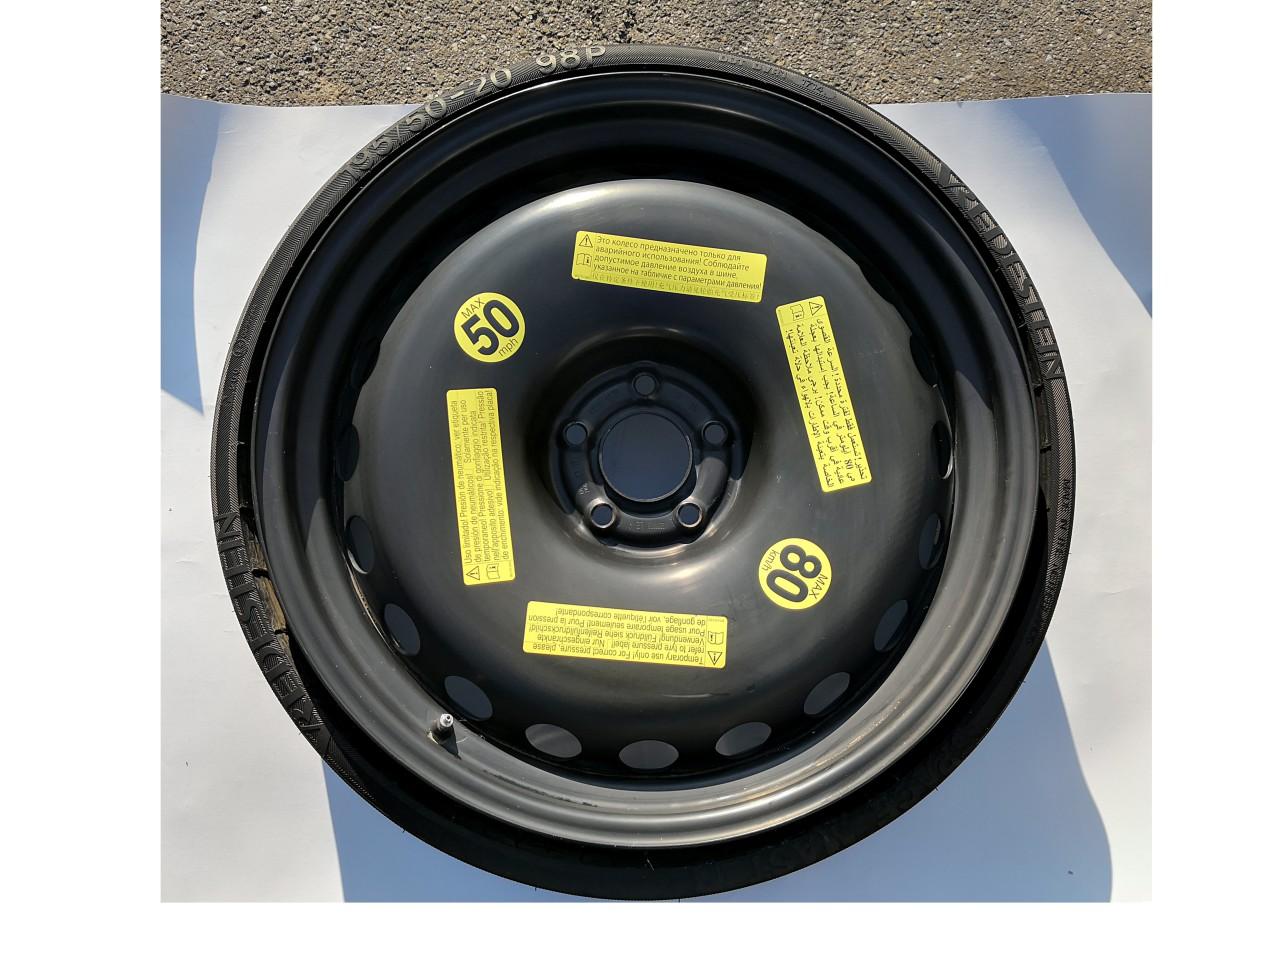 "Roata Rezerva Slim 20"" Audi A6,A7,Q5,Q7,Q8,etc 5x112"